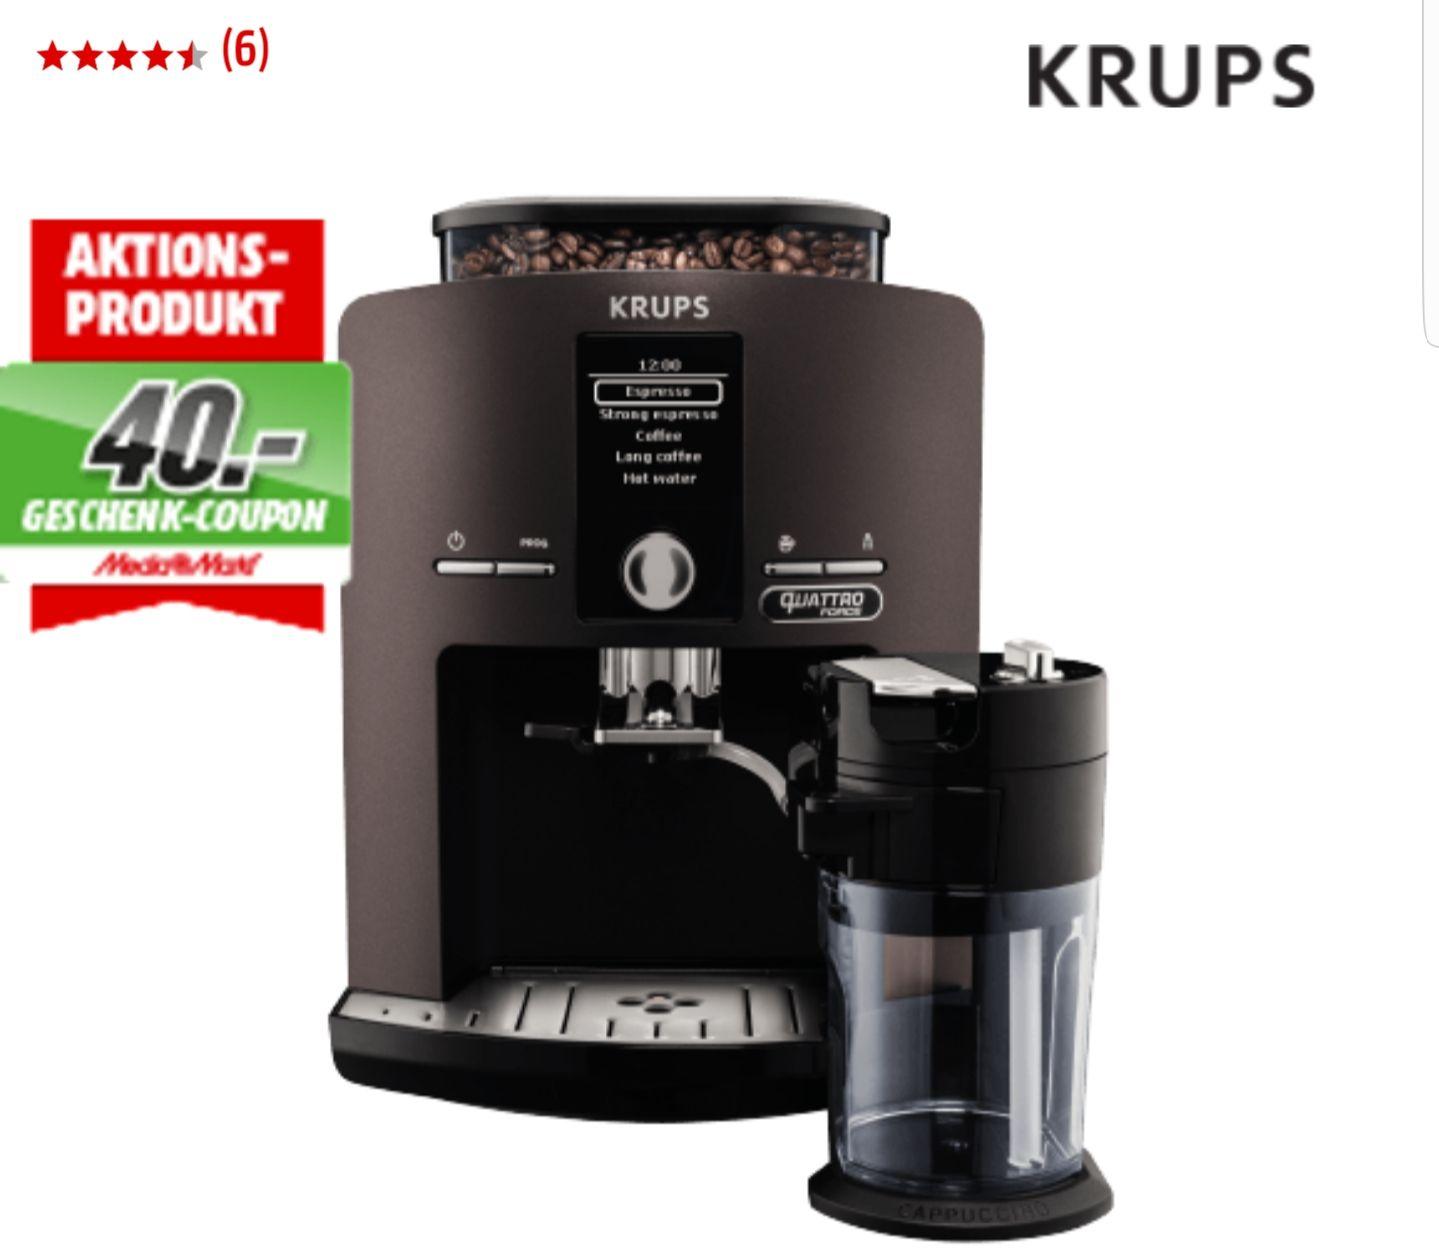 MediaMarkt: KRUPS EA829P Latt´Espress Kaffeevollautomat nur 399 Euro ink 40 Euro Geschenk-Coupon geschenkt